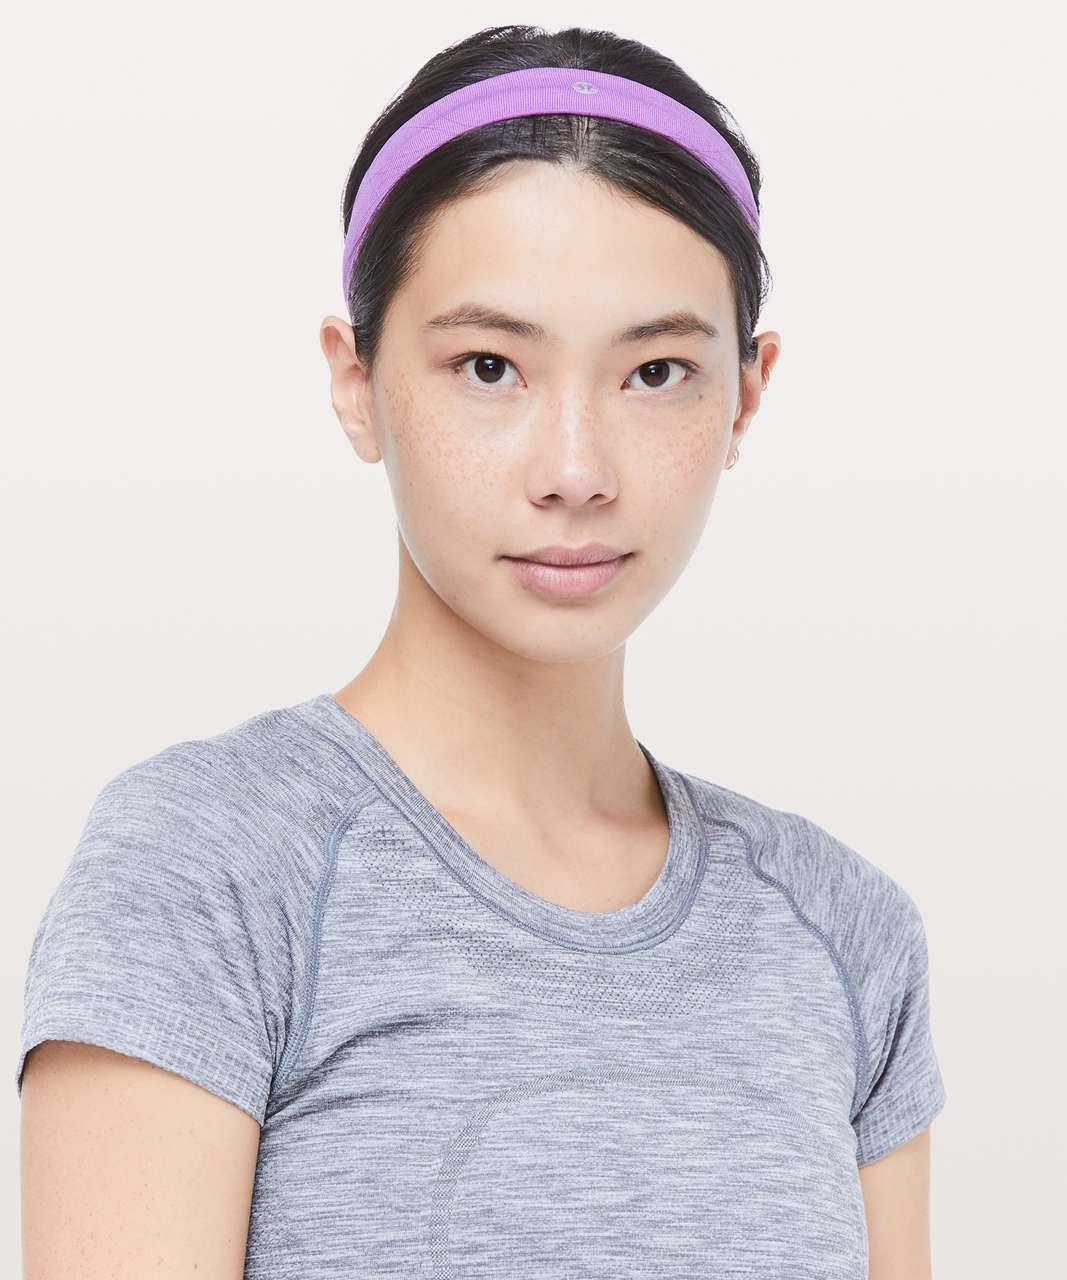 Lululemon Cardio Cross Trainer Headband - Purple Blossom / White